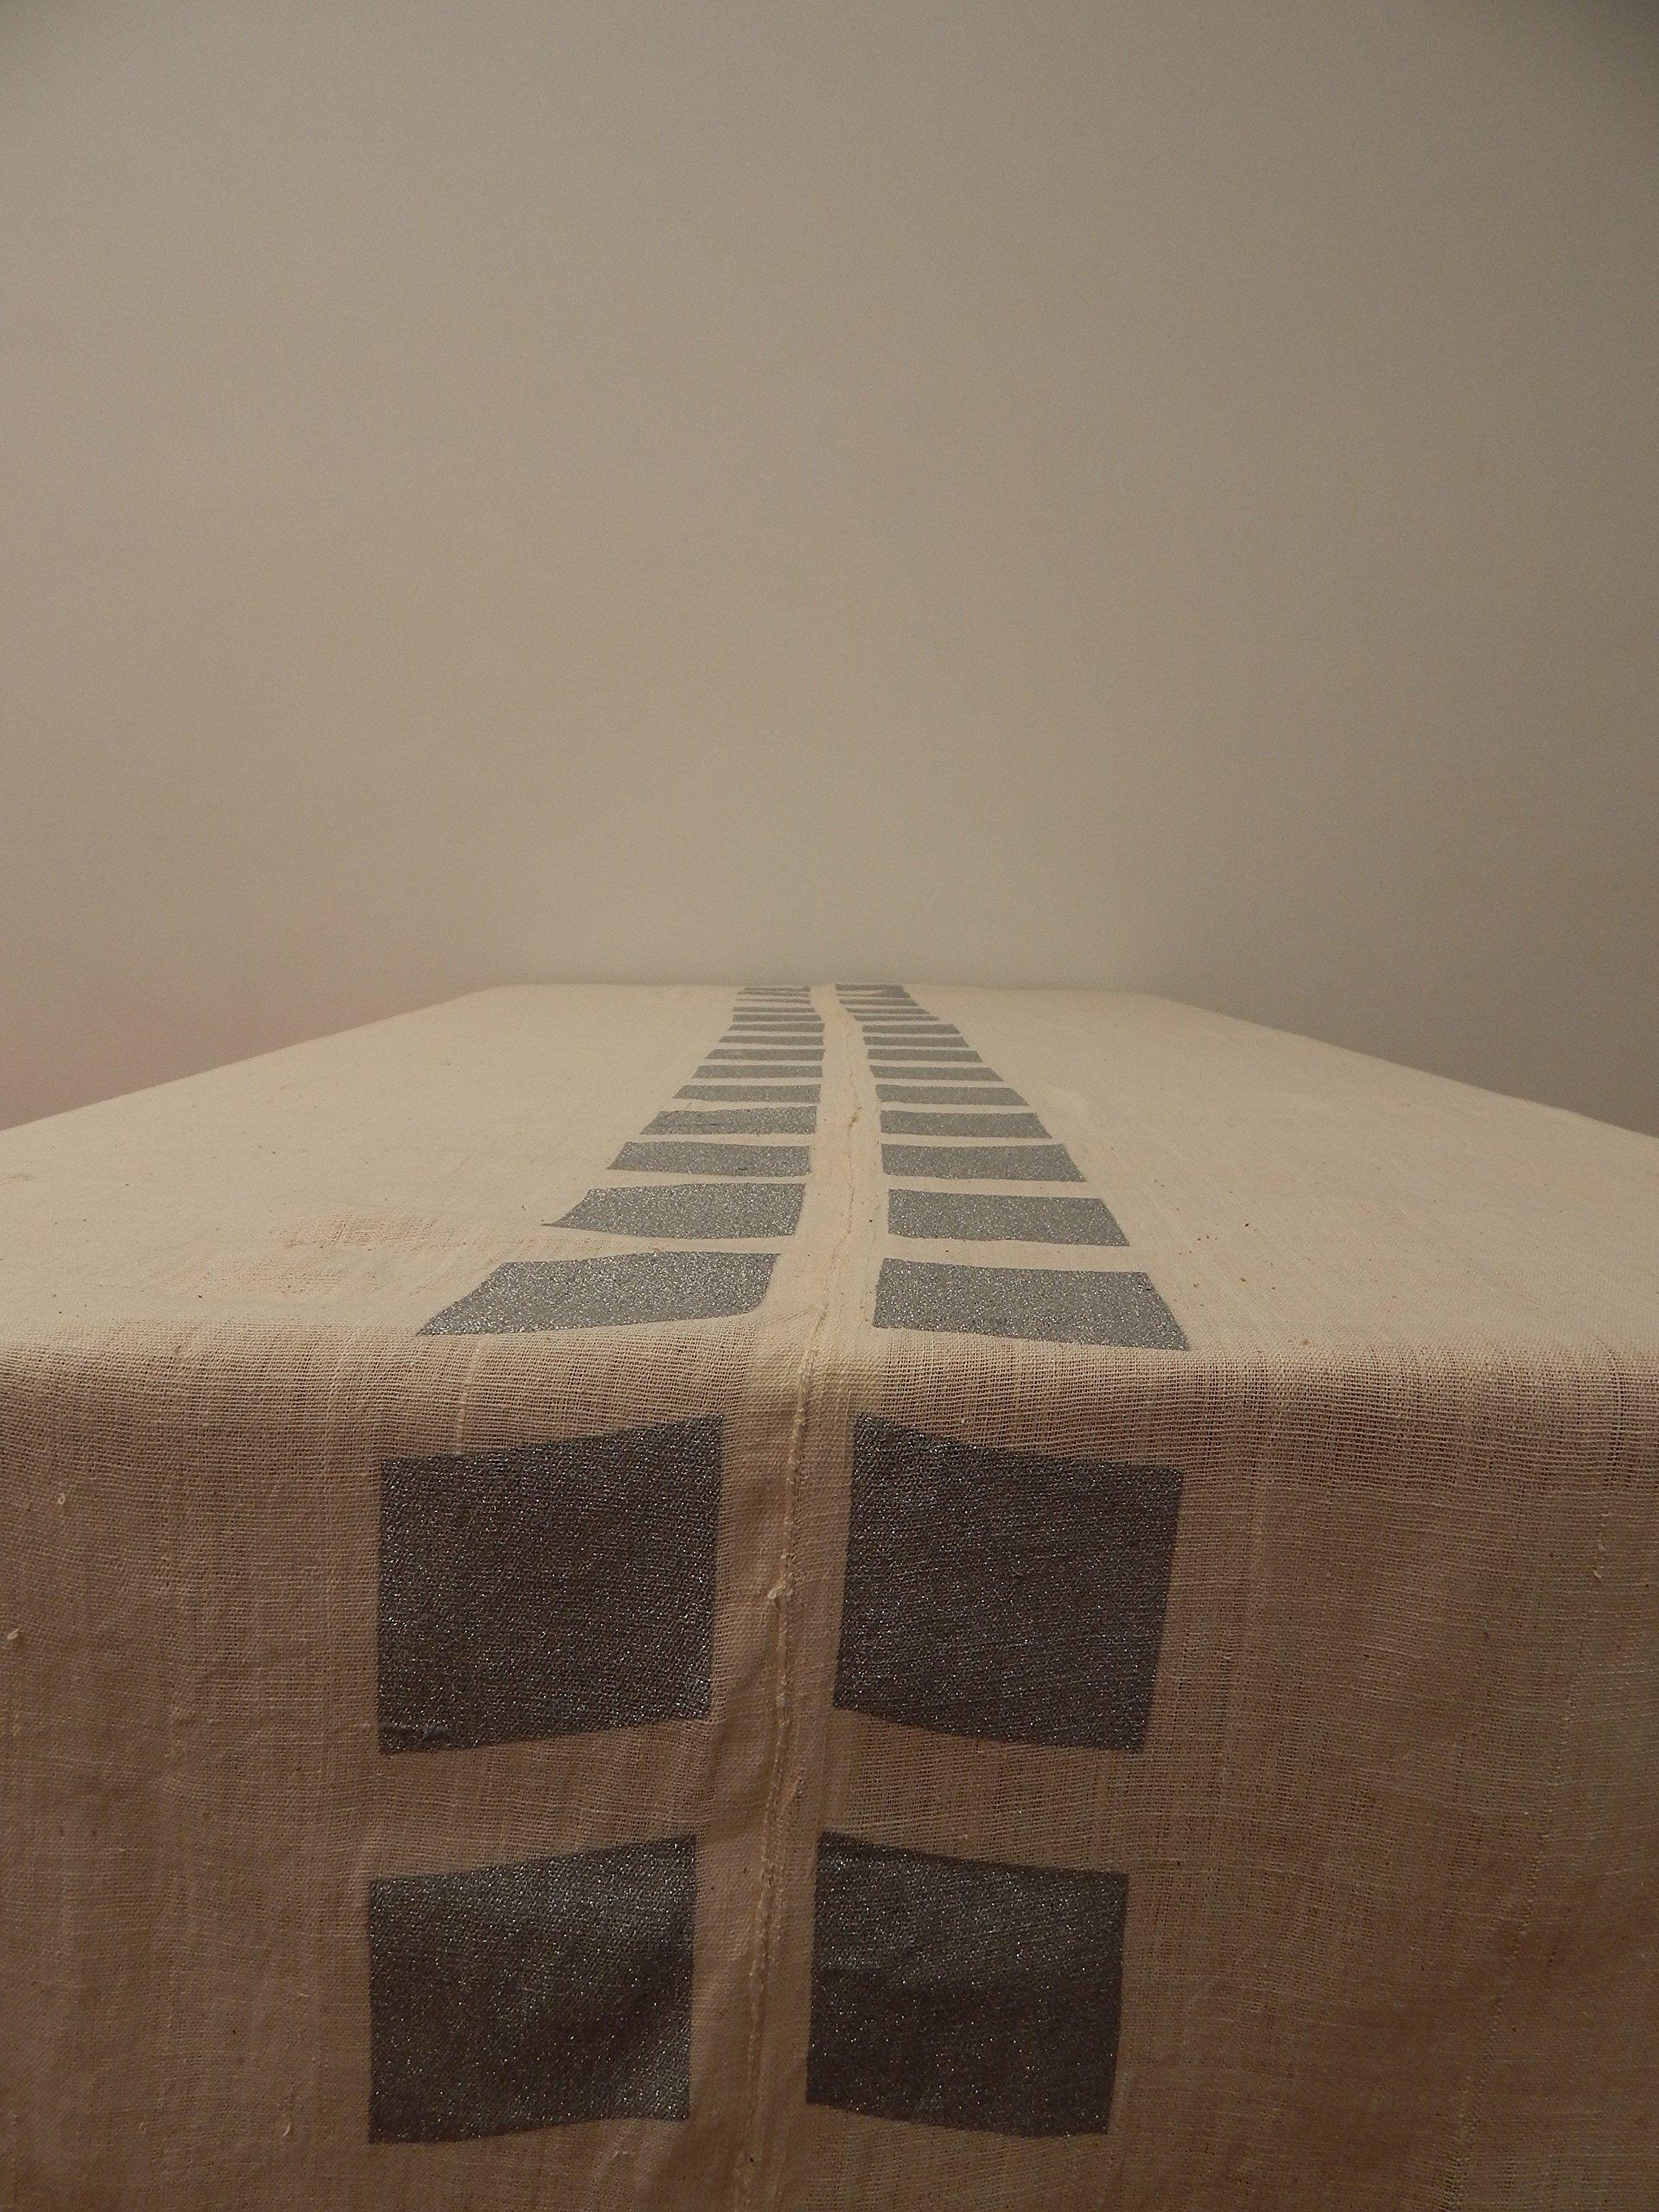 Gitika Goyal Home Cotton Khadi Silver Screen Printed Tablecloth with Square Design, Cream, 72'' x 108''